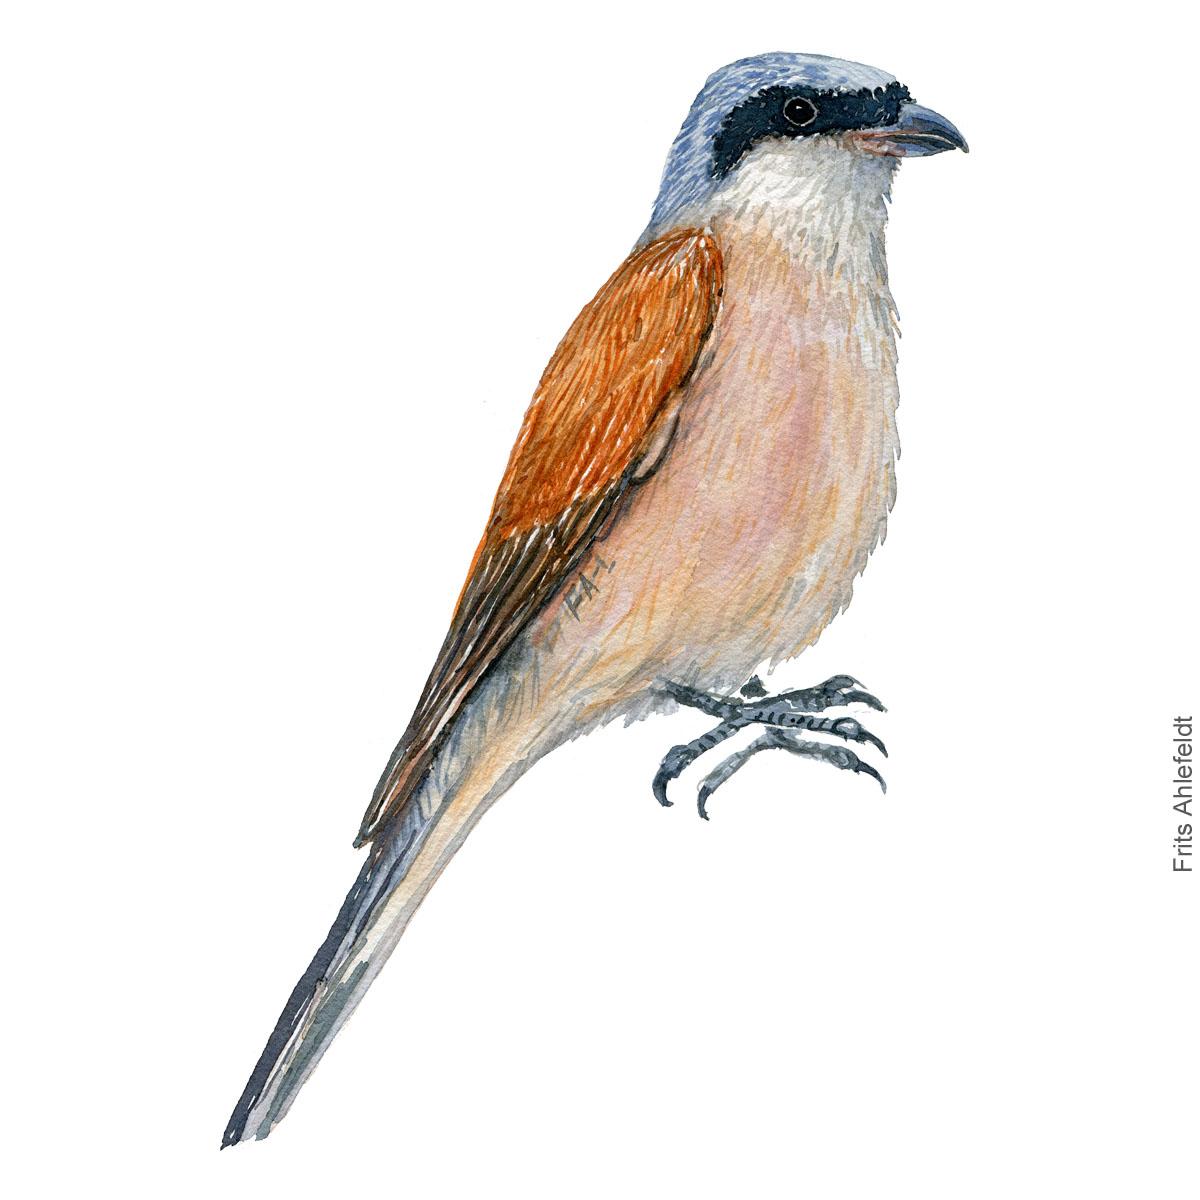 Roedrygget tornskade. Red backed shrike Haerfugl - Eurasian Hoopoe bird watercolor illustration. Painting by Frits Ahlefeldt. Fugle akvarel